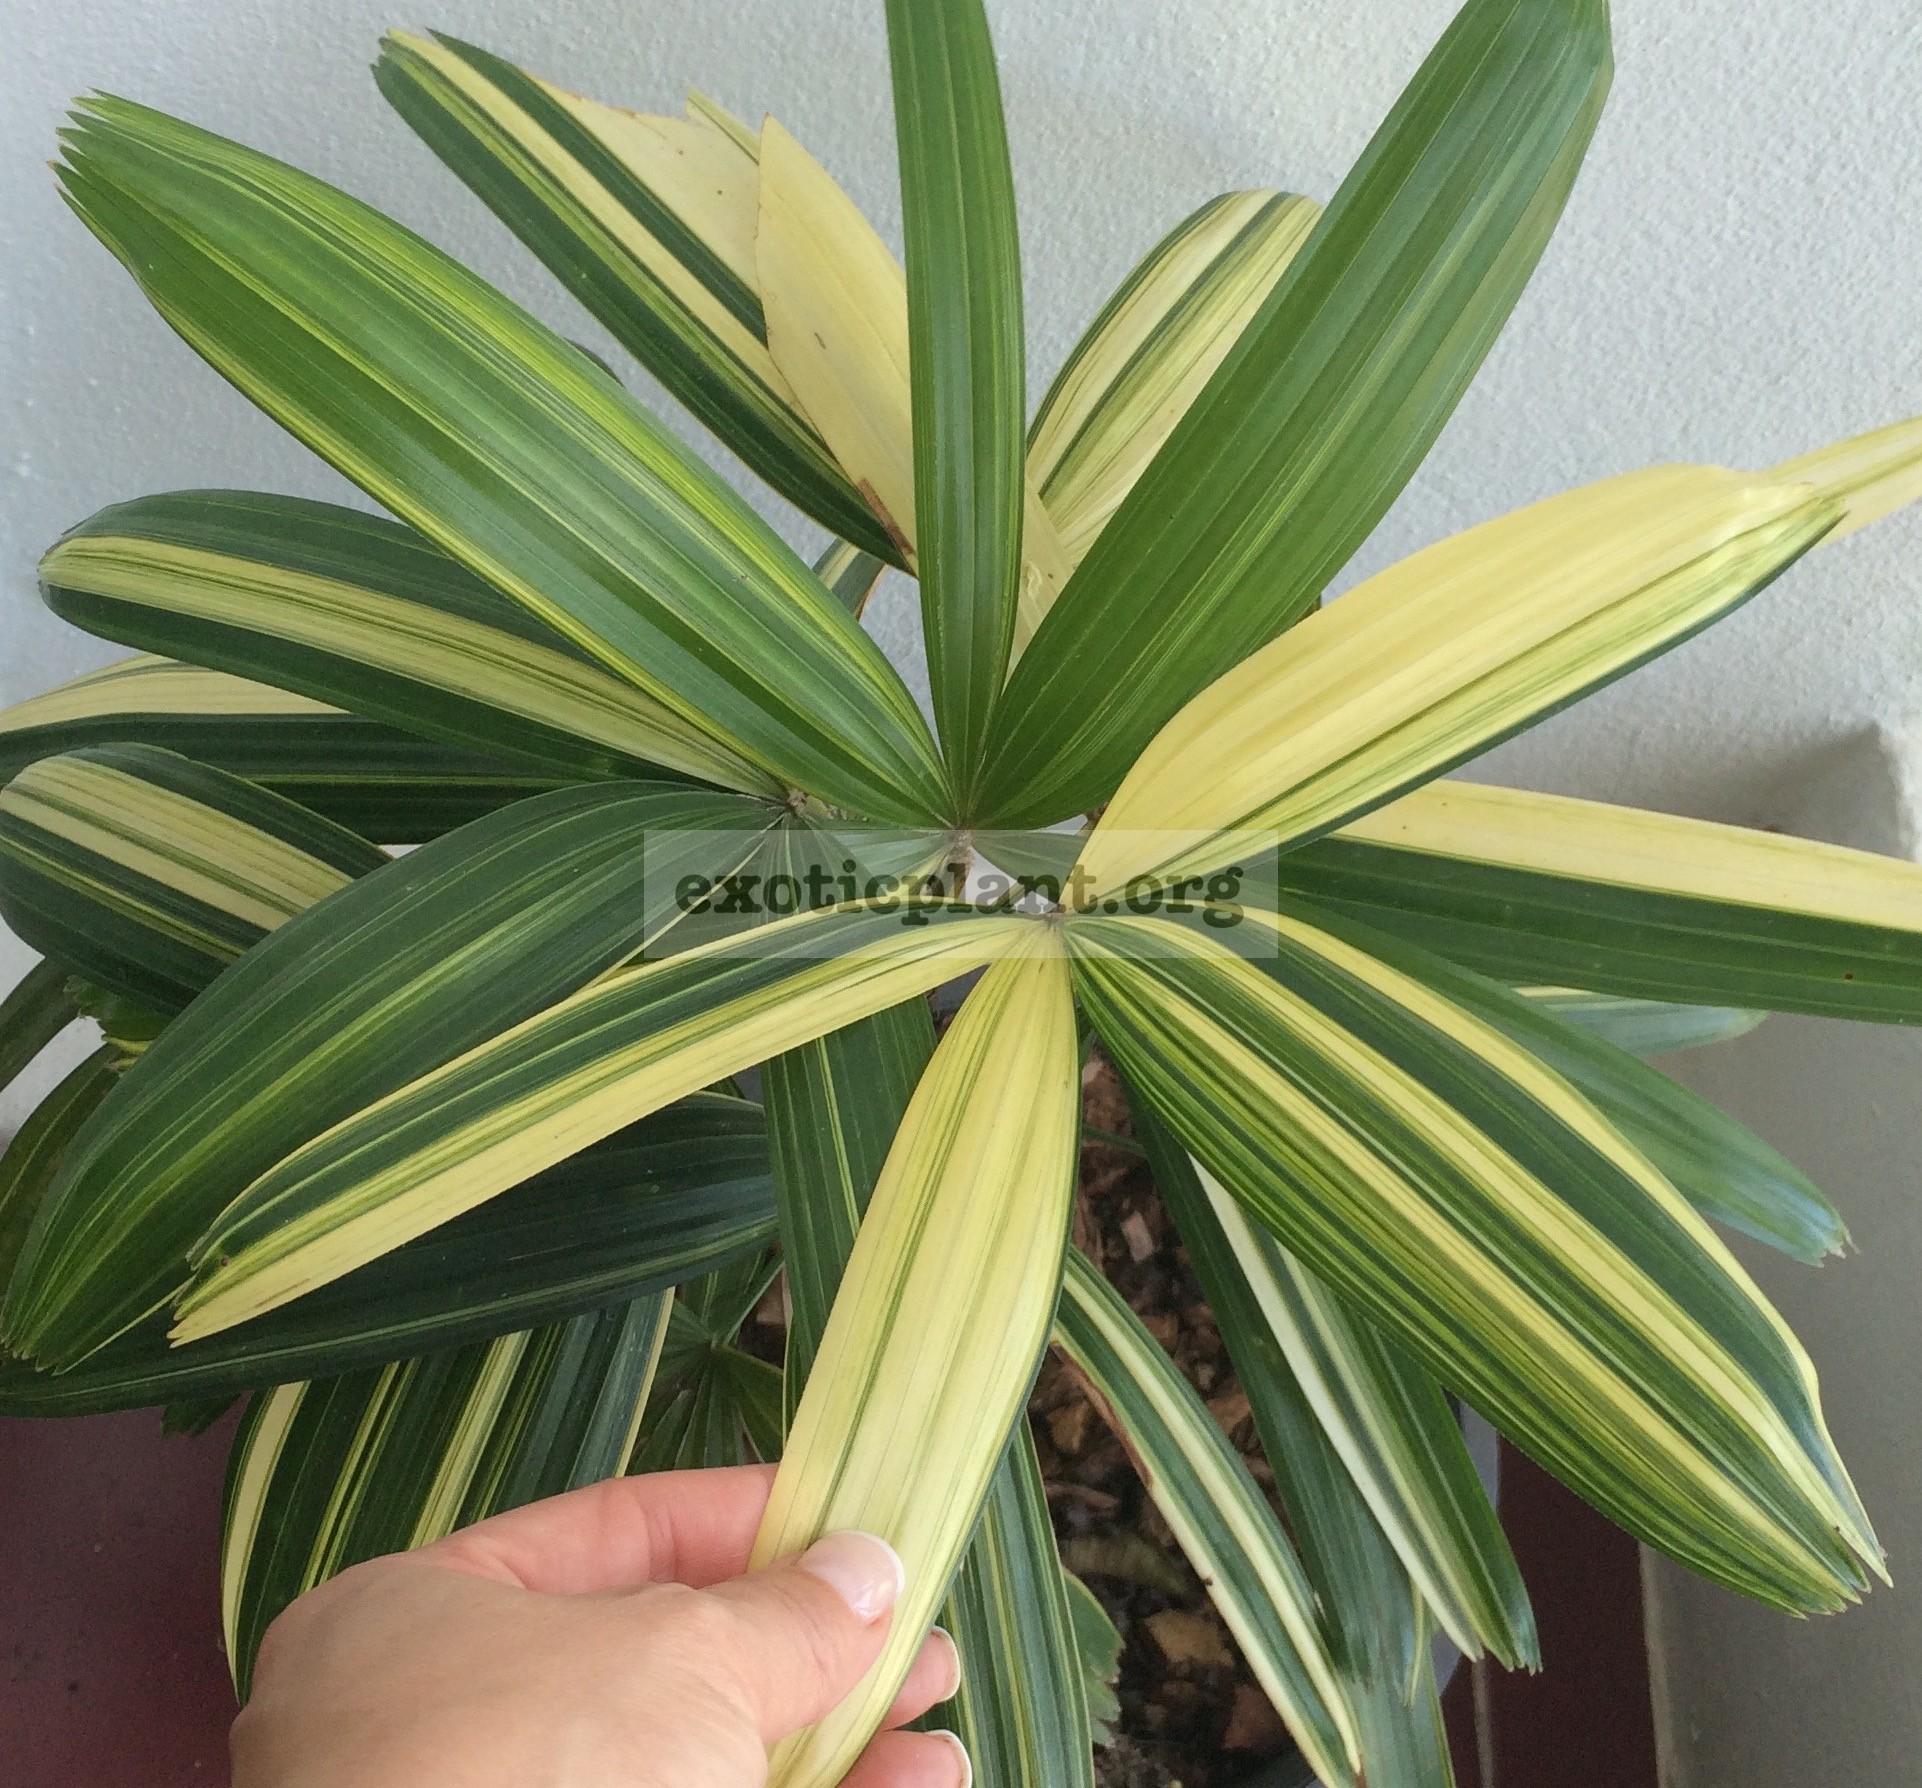 rhapis exselsa variegated (white variegated) / Рапис эксельза вариегатный, Рапис высокий вариегатный 50-65